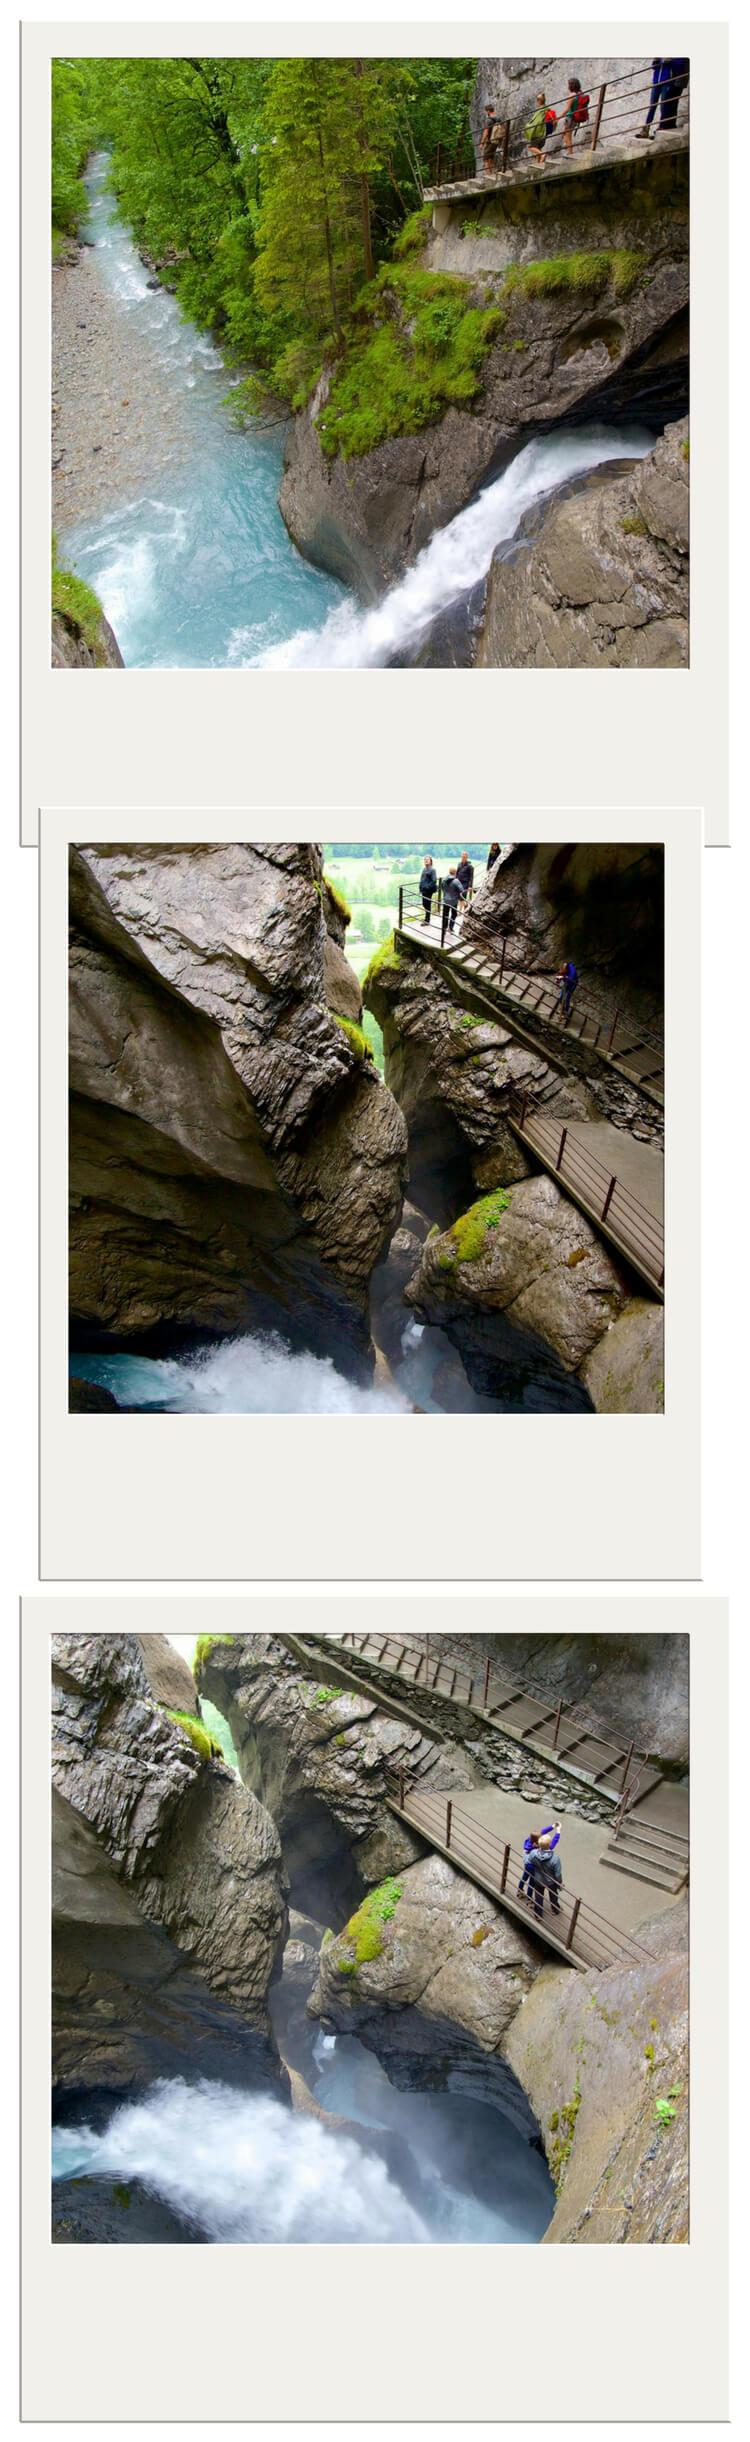 Trümmelbach Falls- suica-lauterbrunnen-como-ir-o-que-fazer